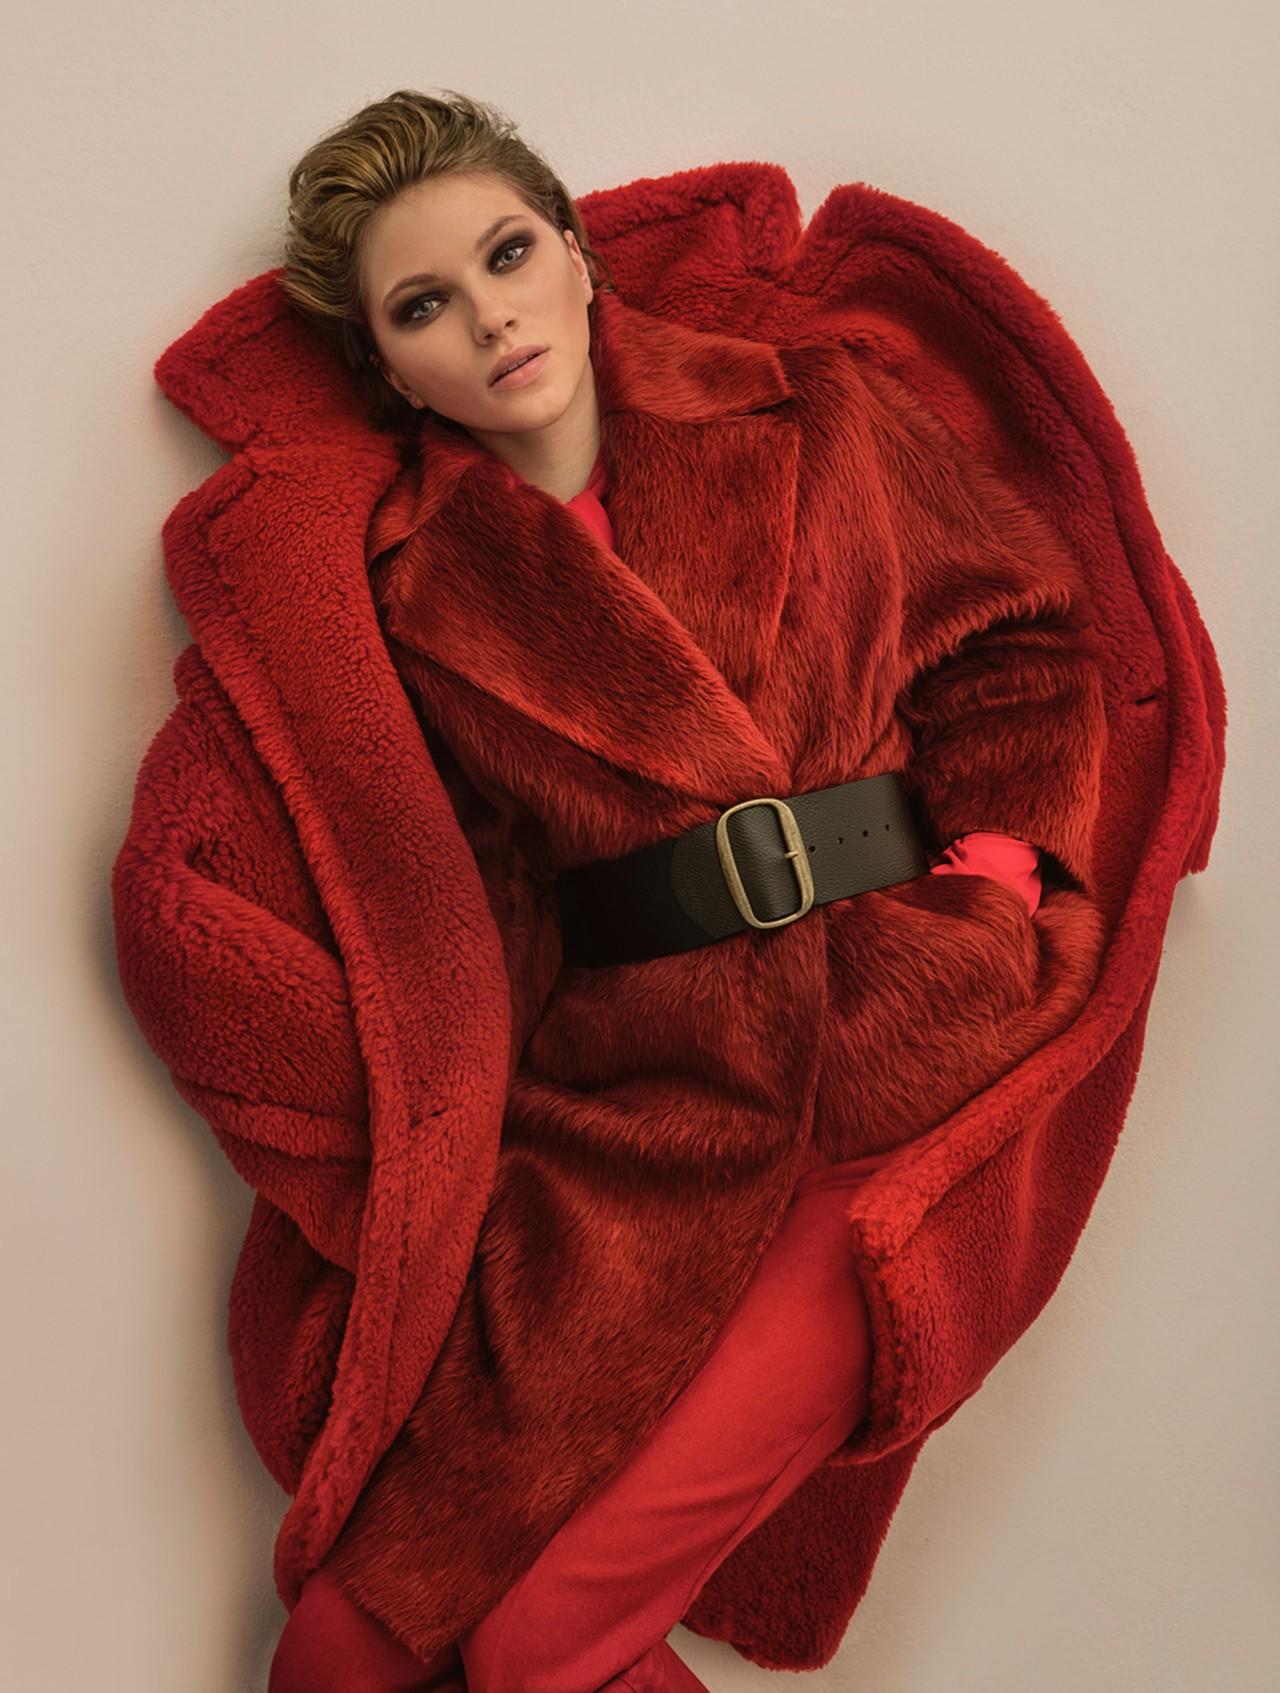 c94b30f240b5 Το νέο GLOW fashion editorial παρουσιάζει τα must-have πανωφόρια της ...